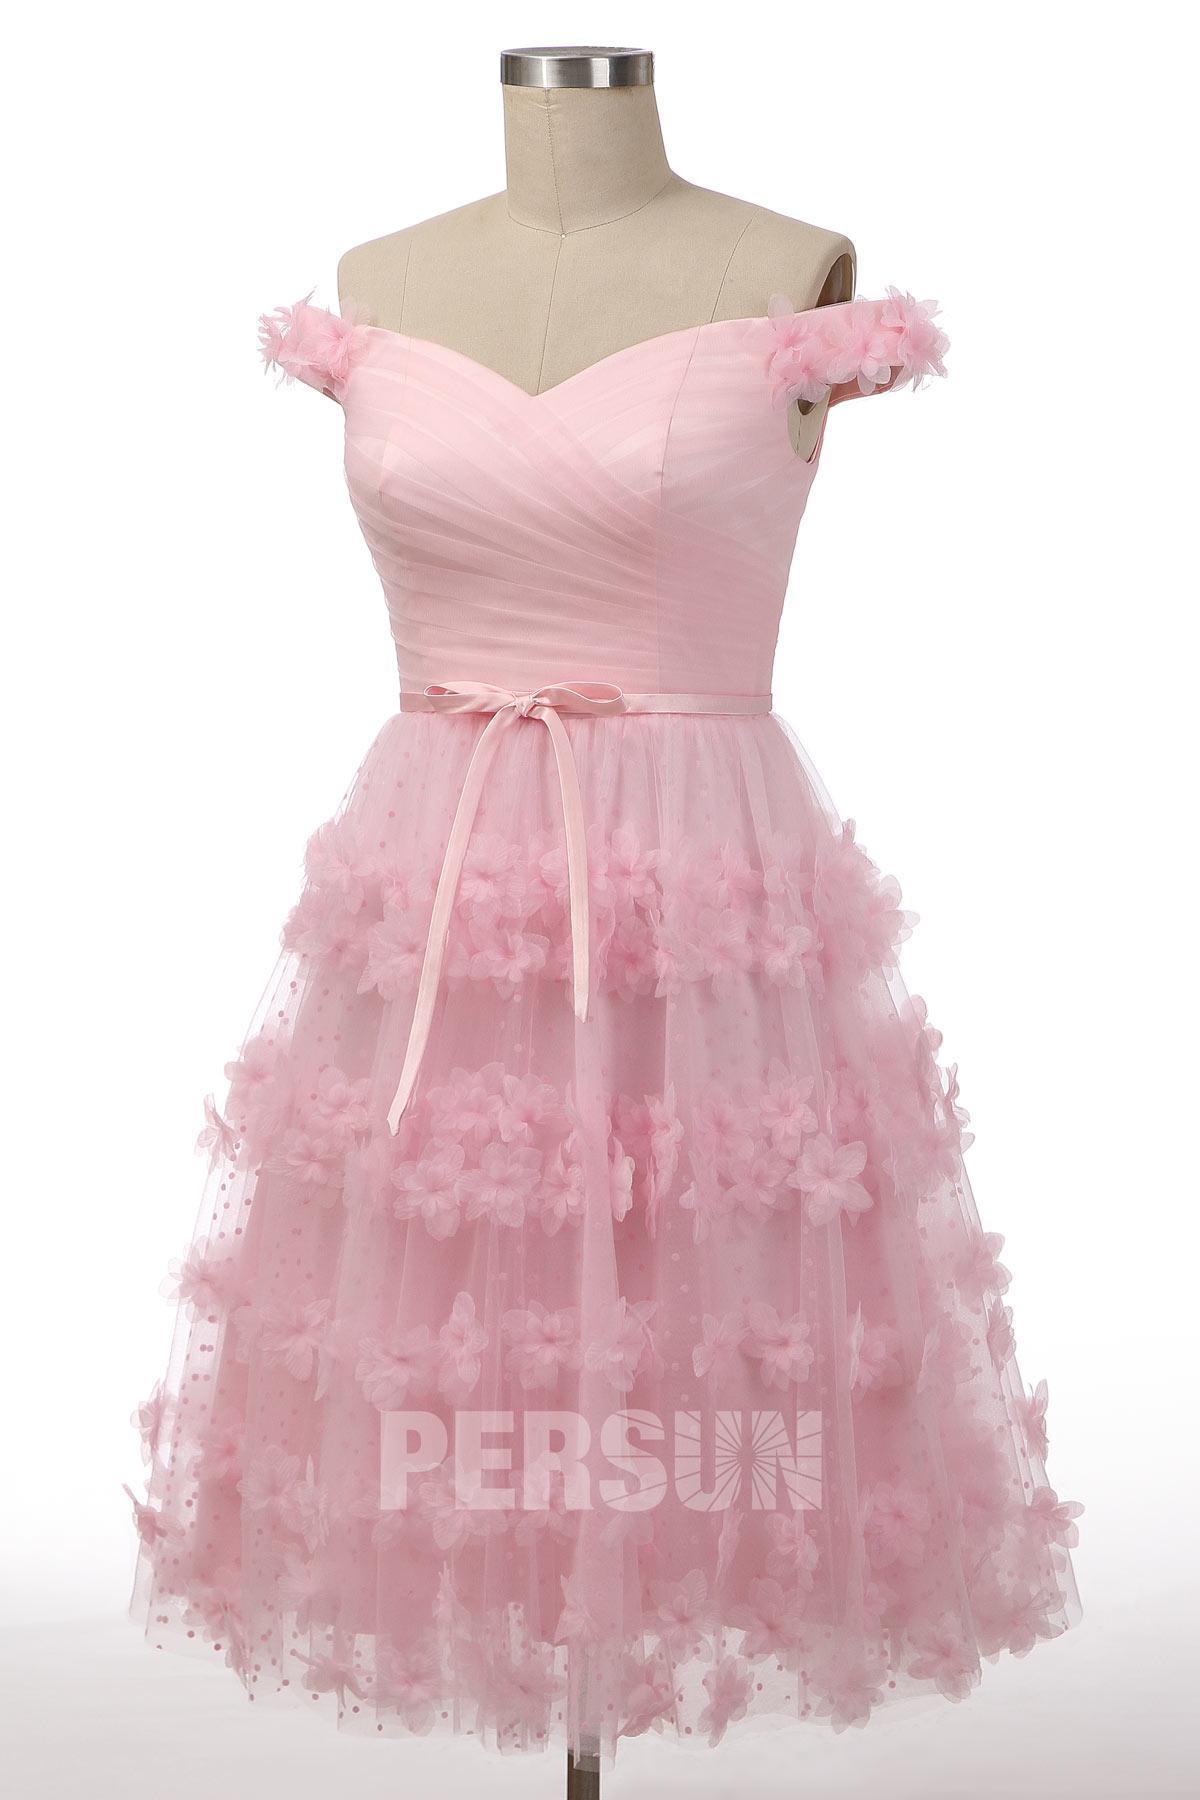 robe de mariée rose mi-longue col bardot embelli de plumes et de fleurs 3D